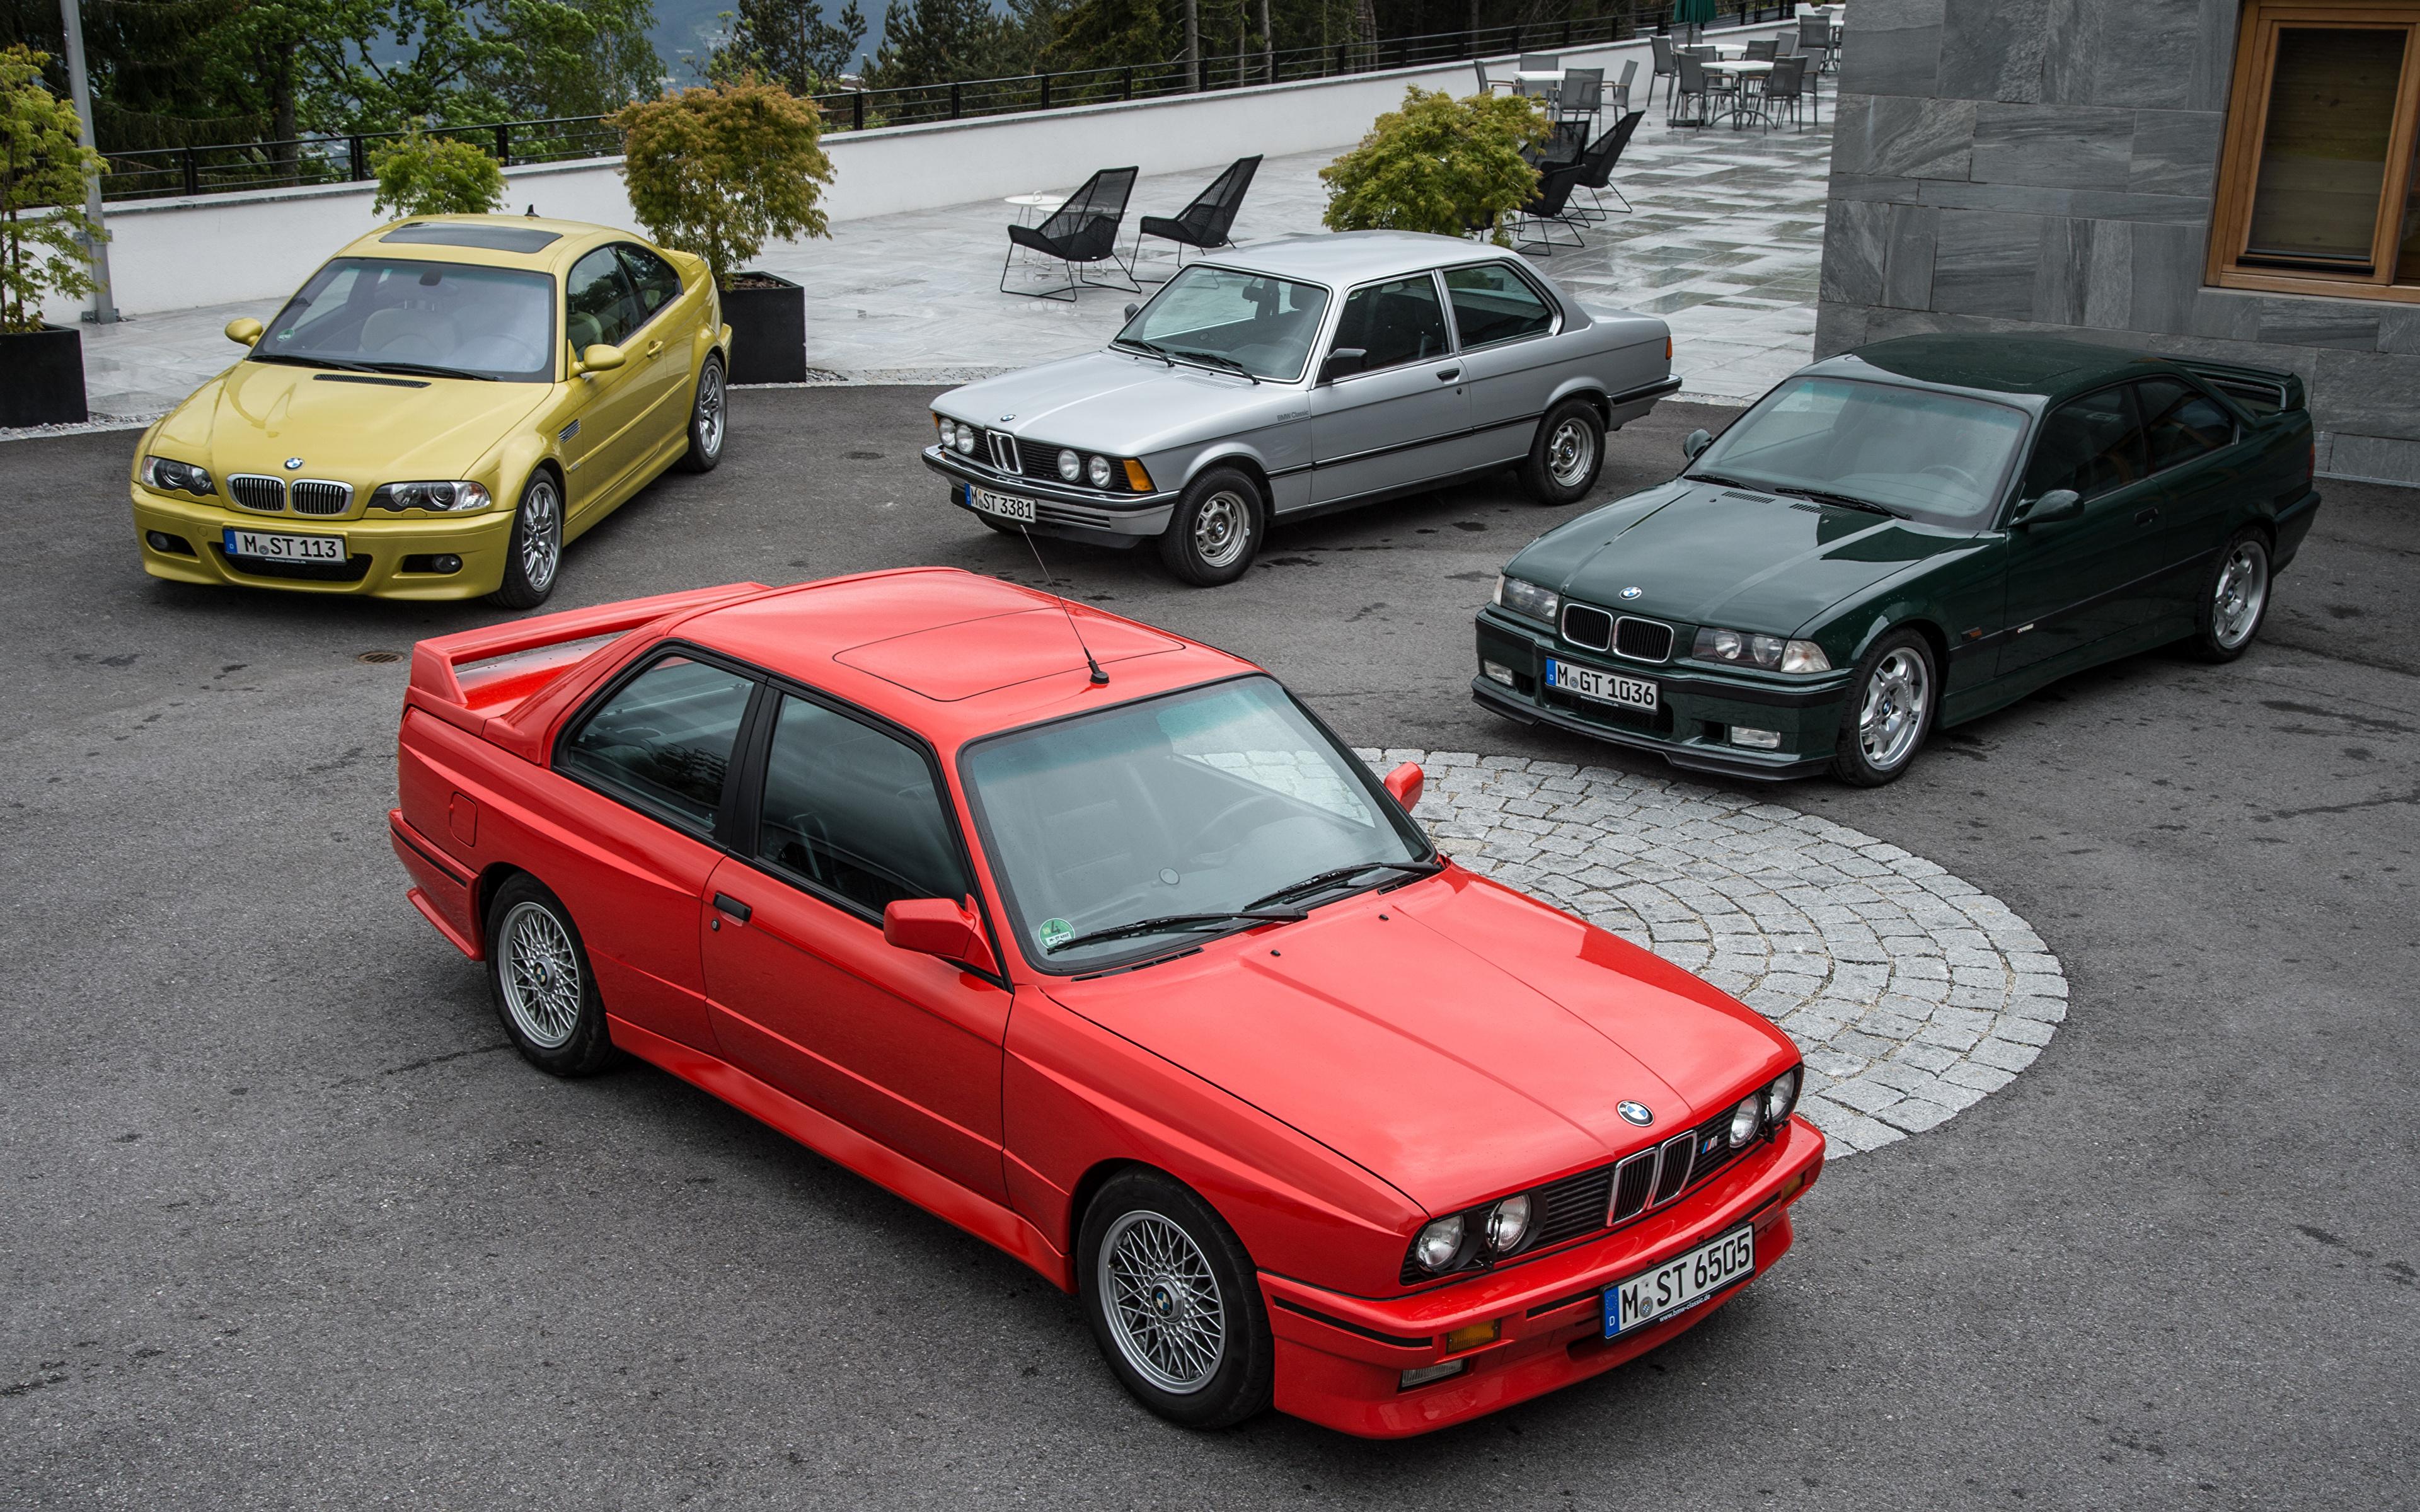 Desktop Wallpapers BMW 1975-2016 3 Series automobile 3840x2400 Cars auto